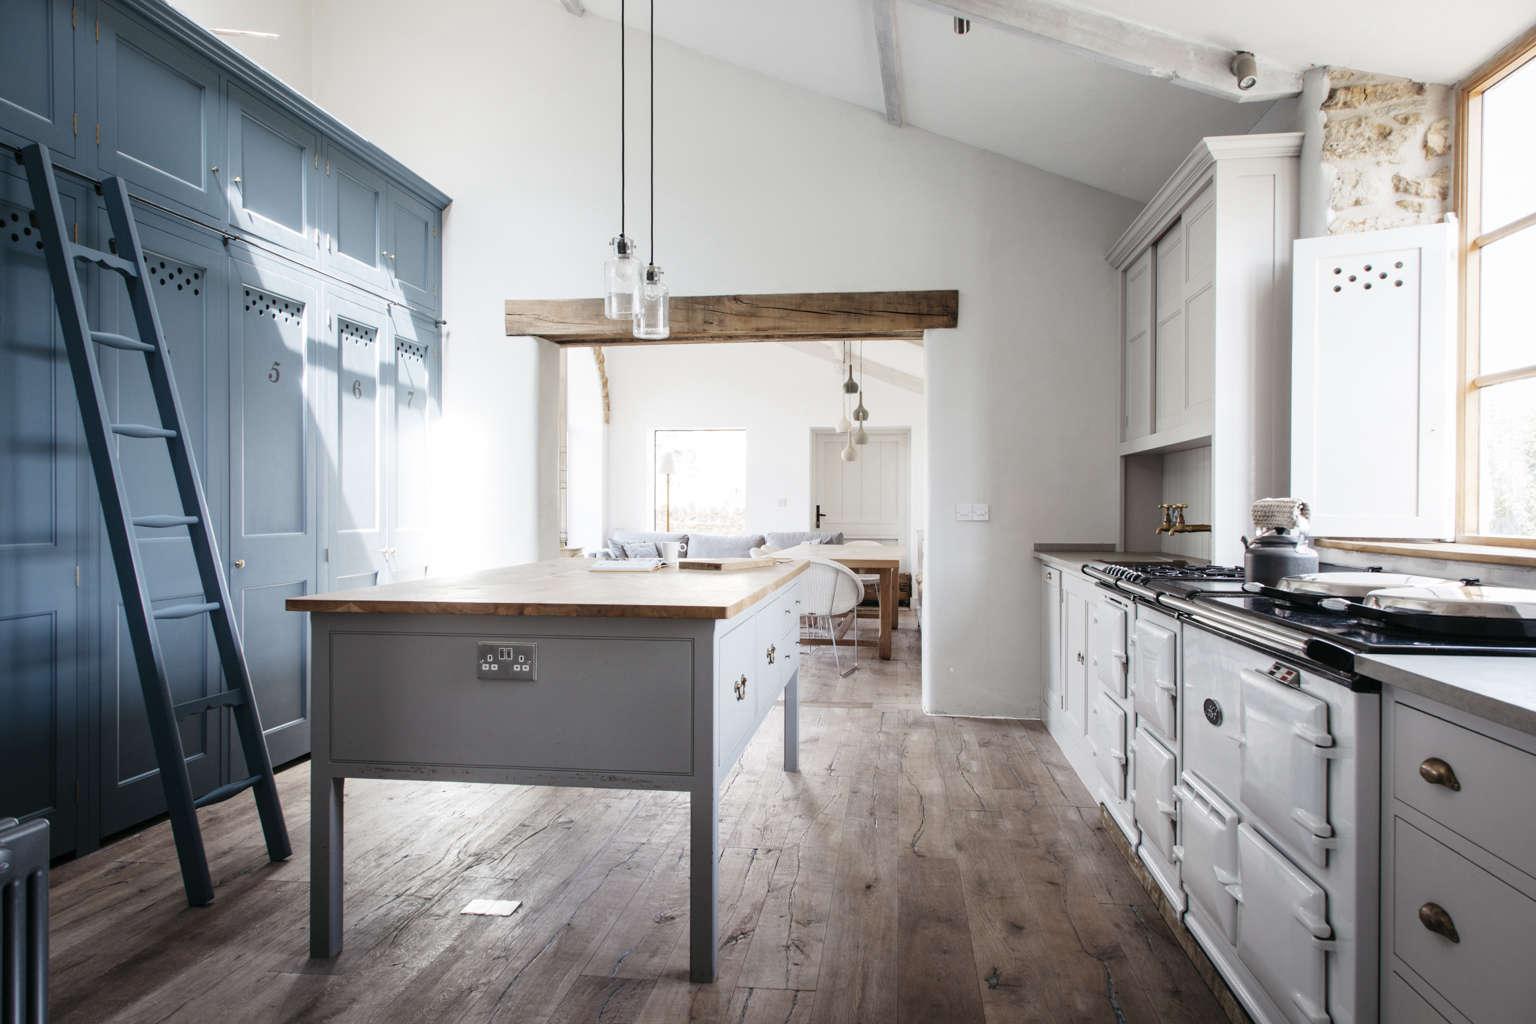 A Dorset farmhouse kitchen by Plain English